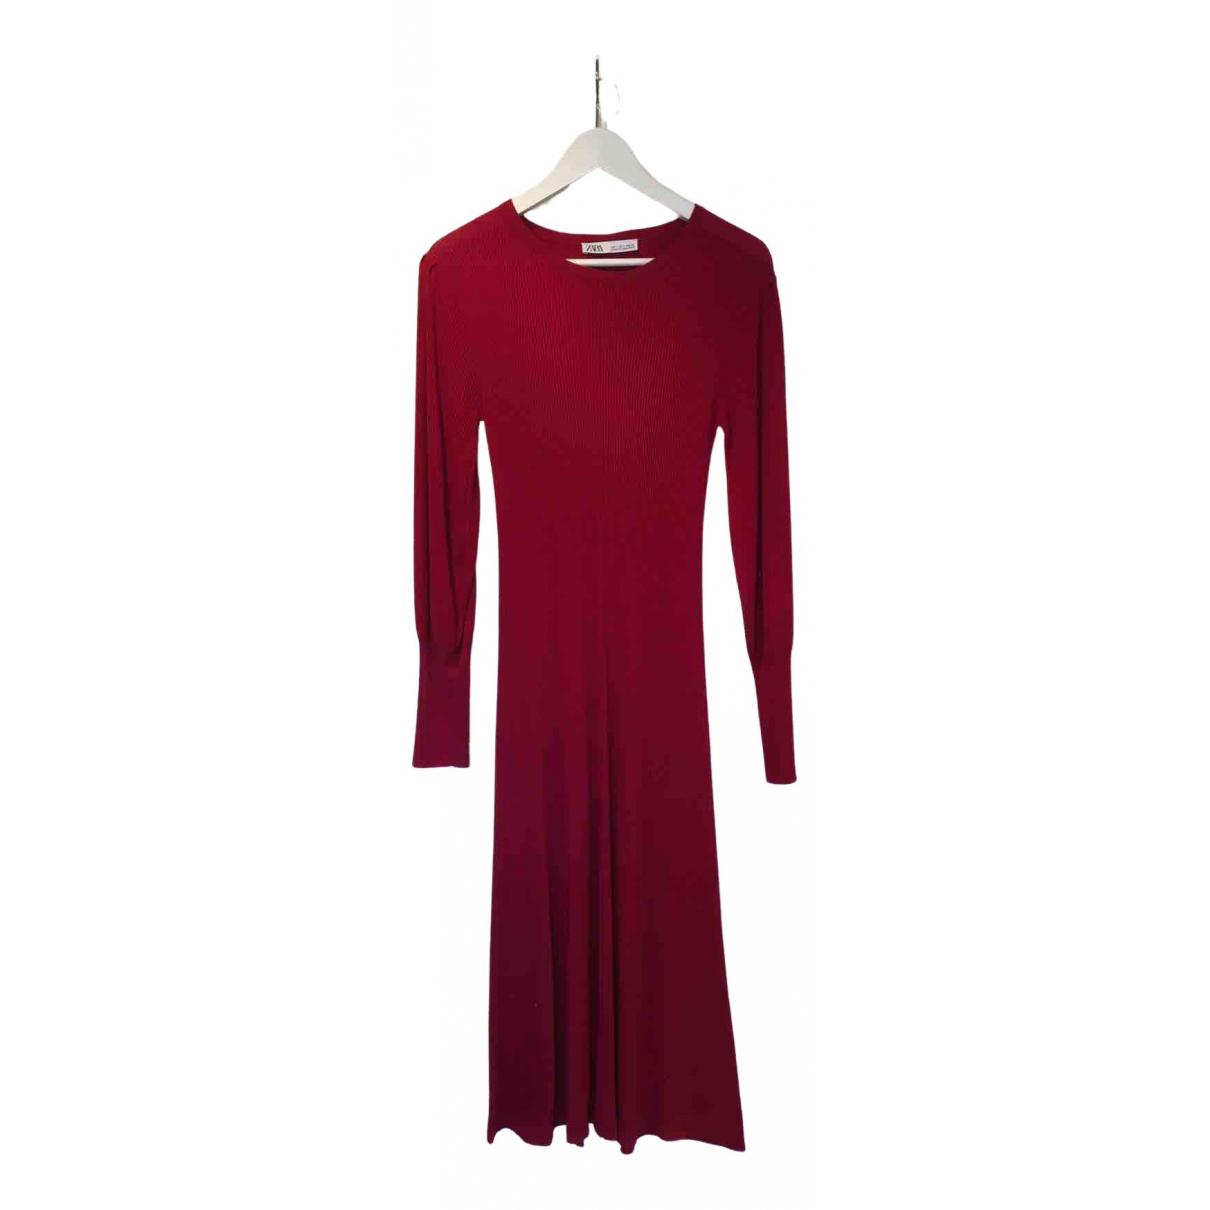 Zara \N Burgundy Cotton - elasthane dress for Women S International